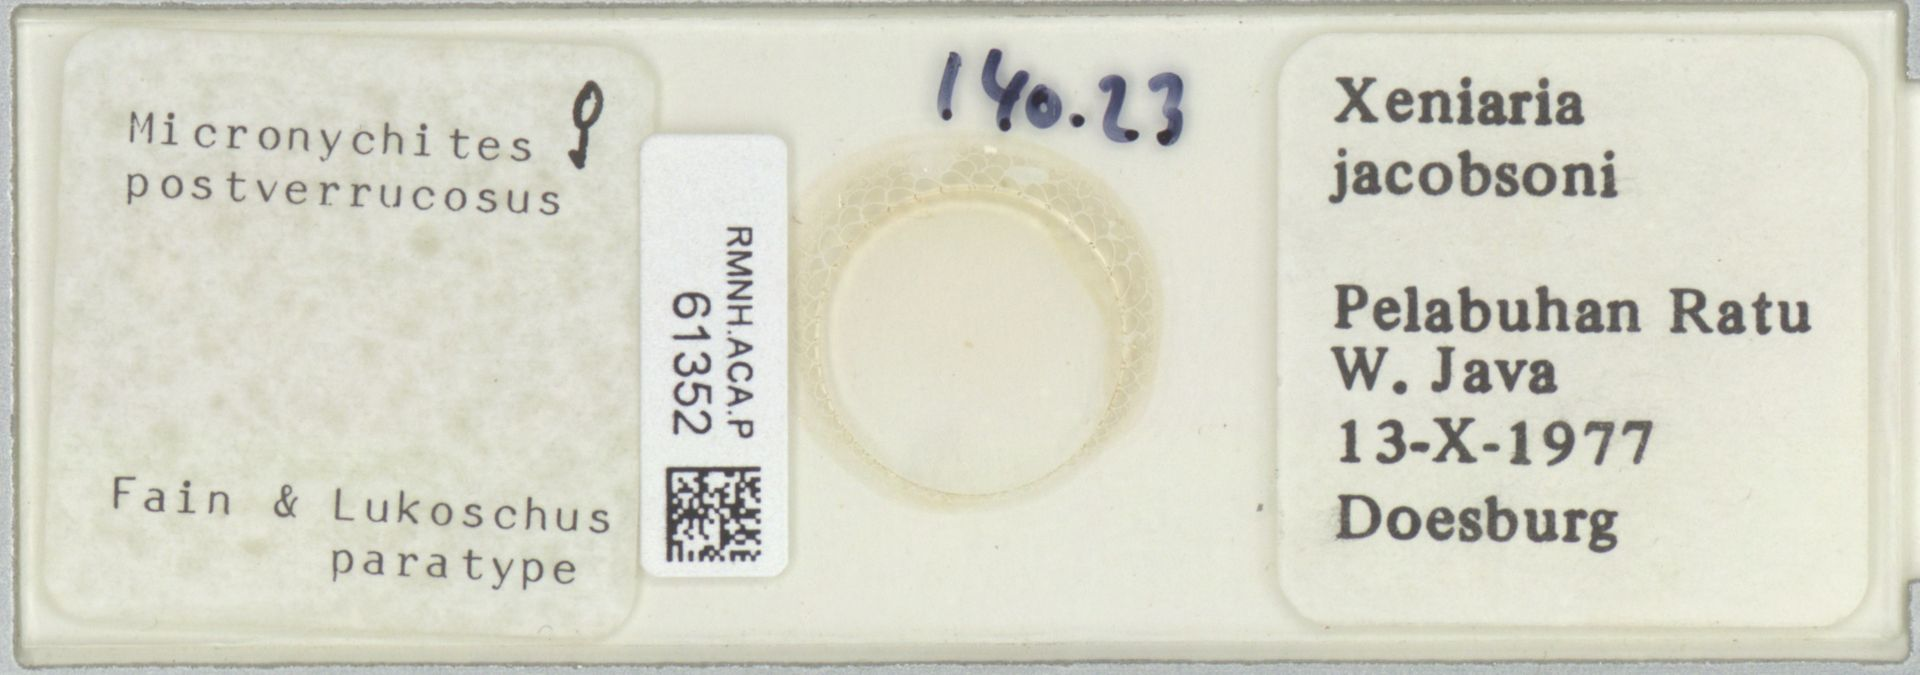 RMNH.ACA.P.61352 | Micronychites postverrucosus Fain & Lukoschus